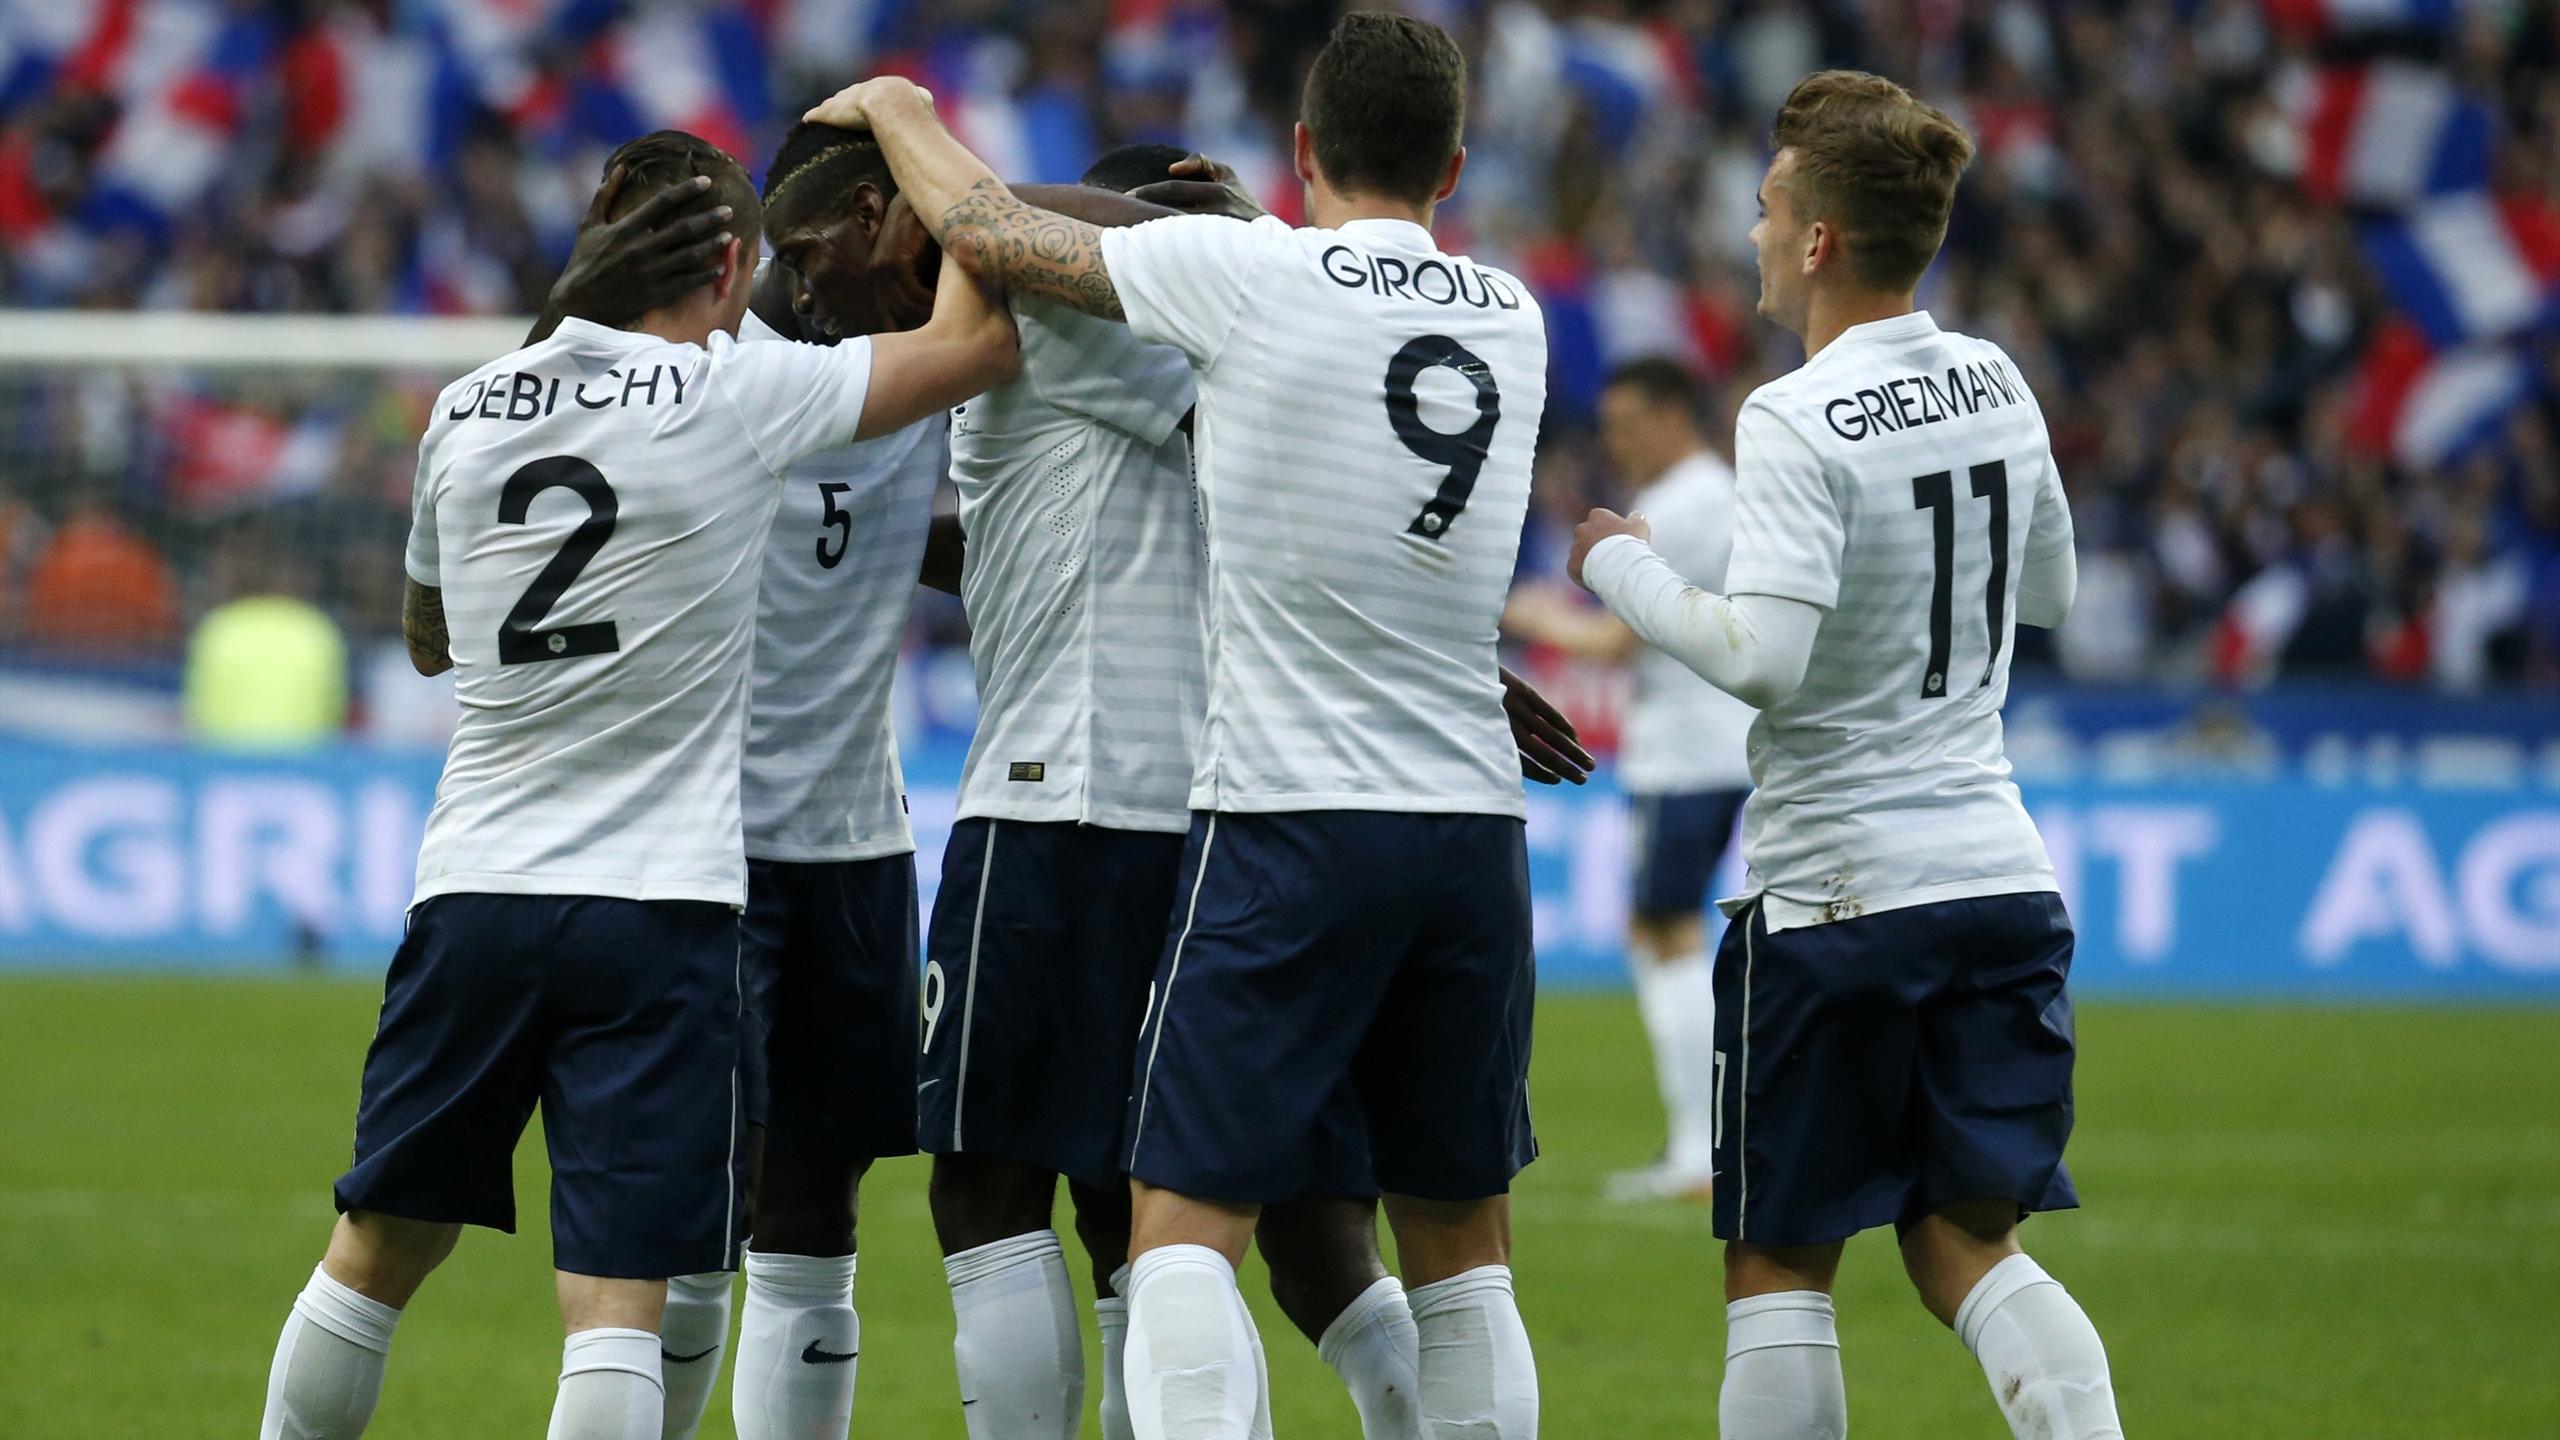 International friendlies - France enjoy easy win against Norway